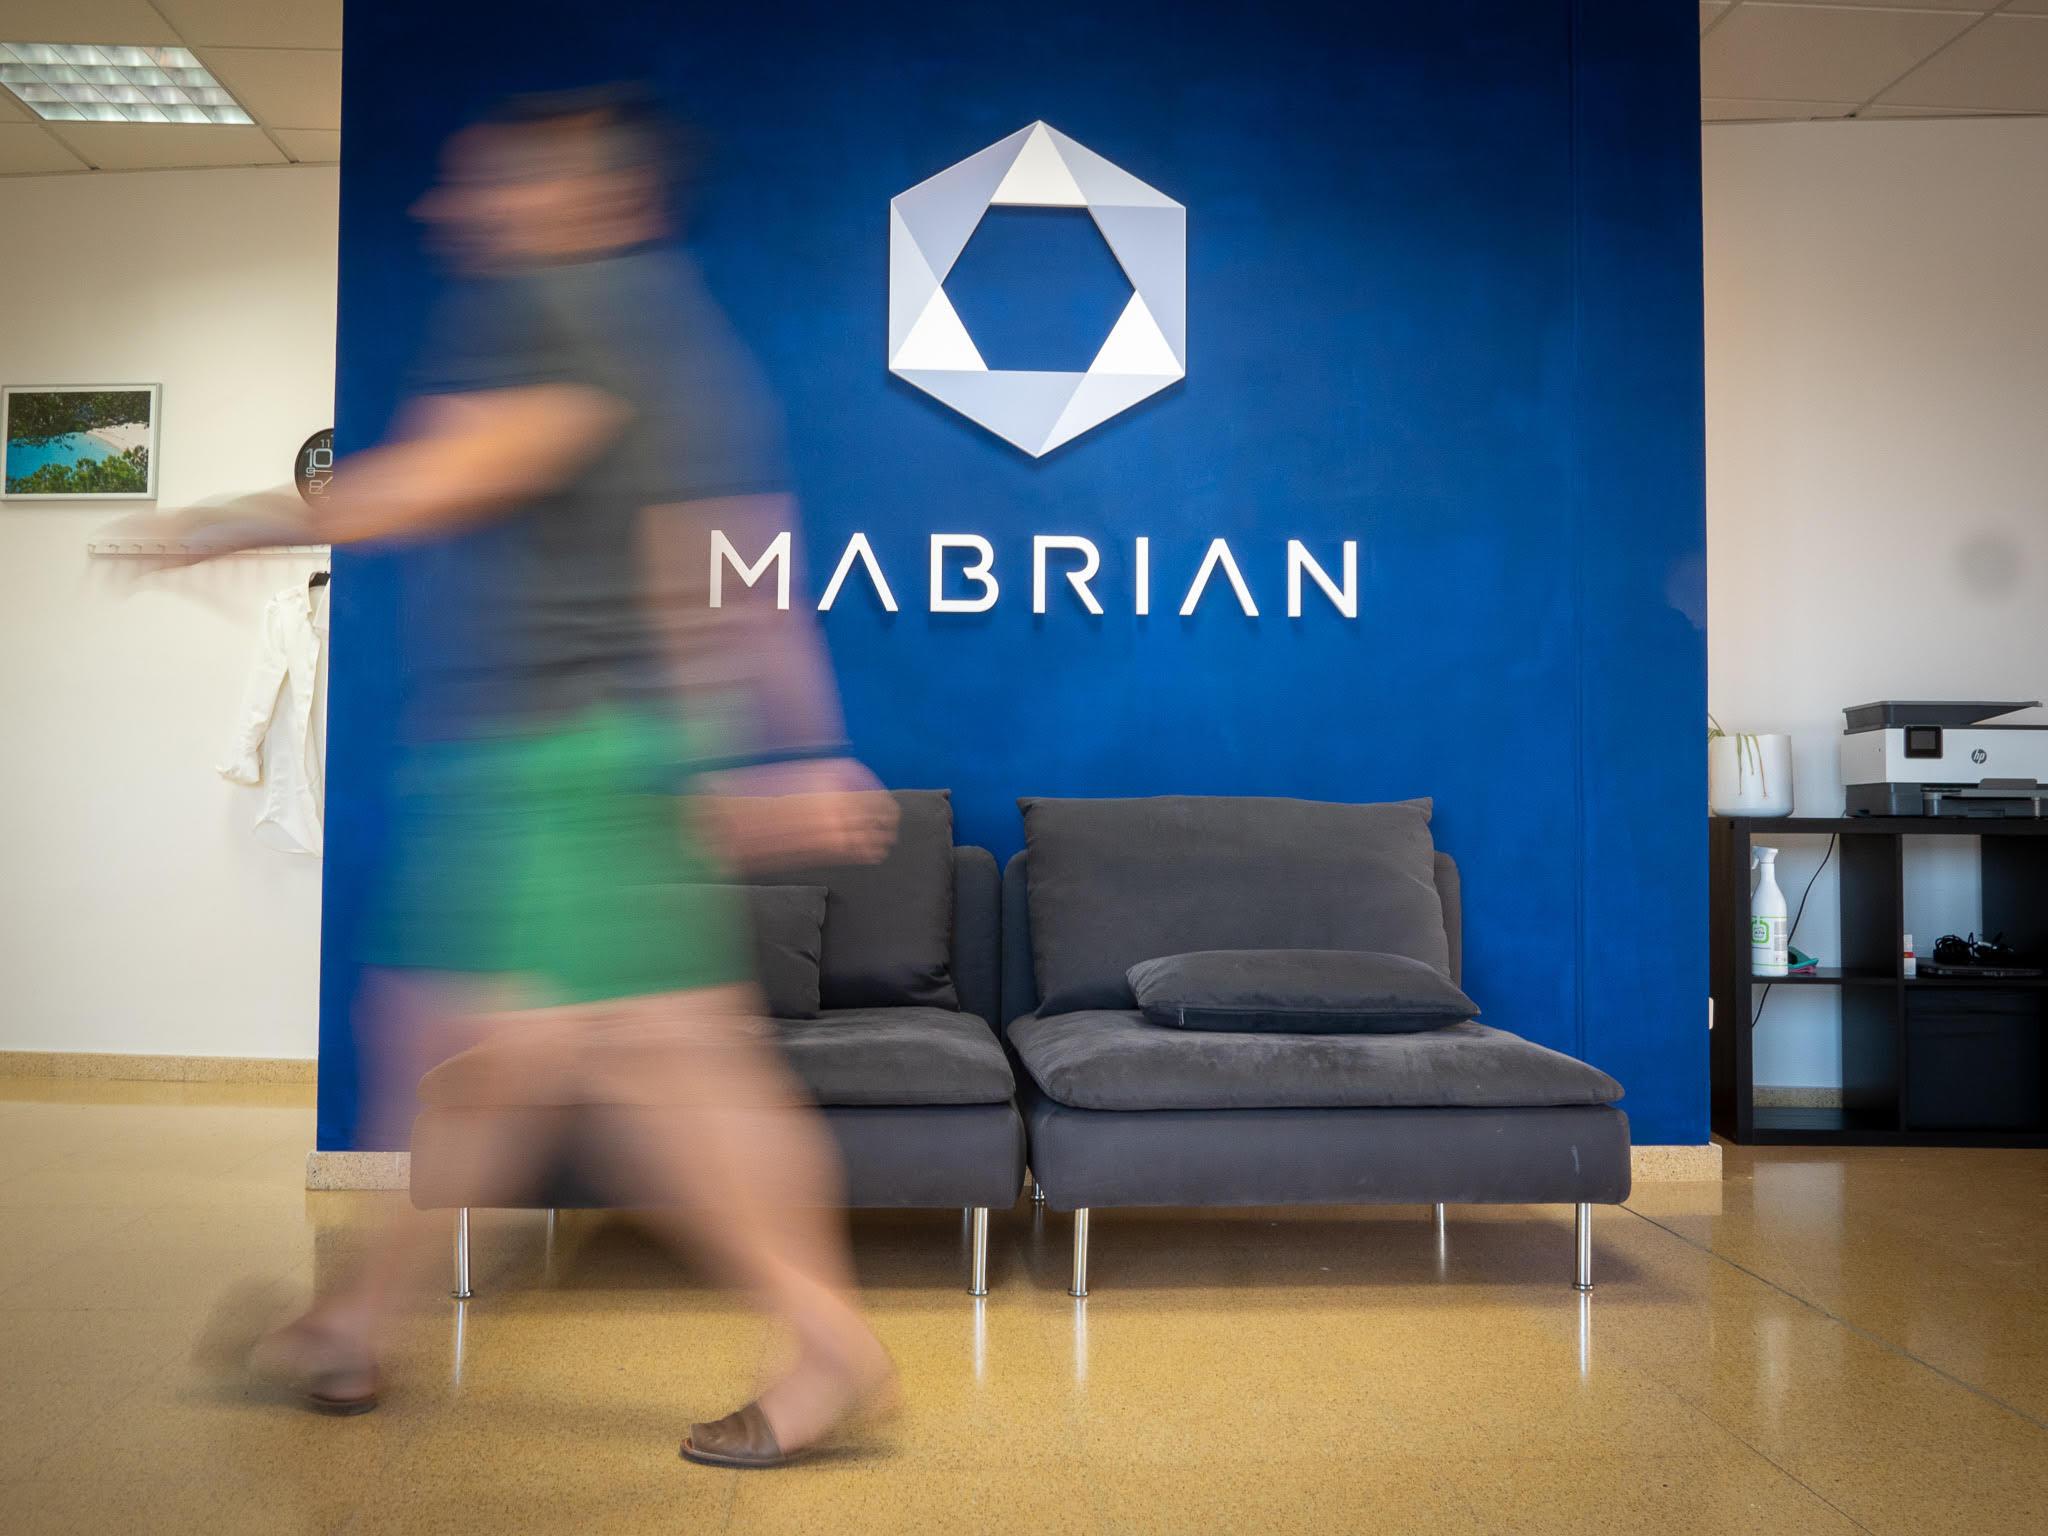 Mabrian la plataforma de big data para destinos inteligentes